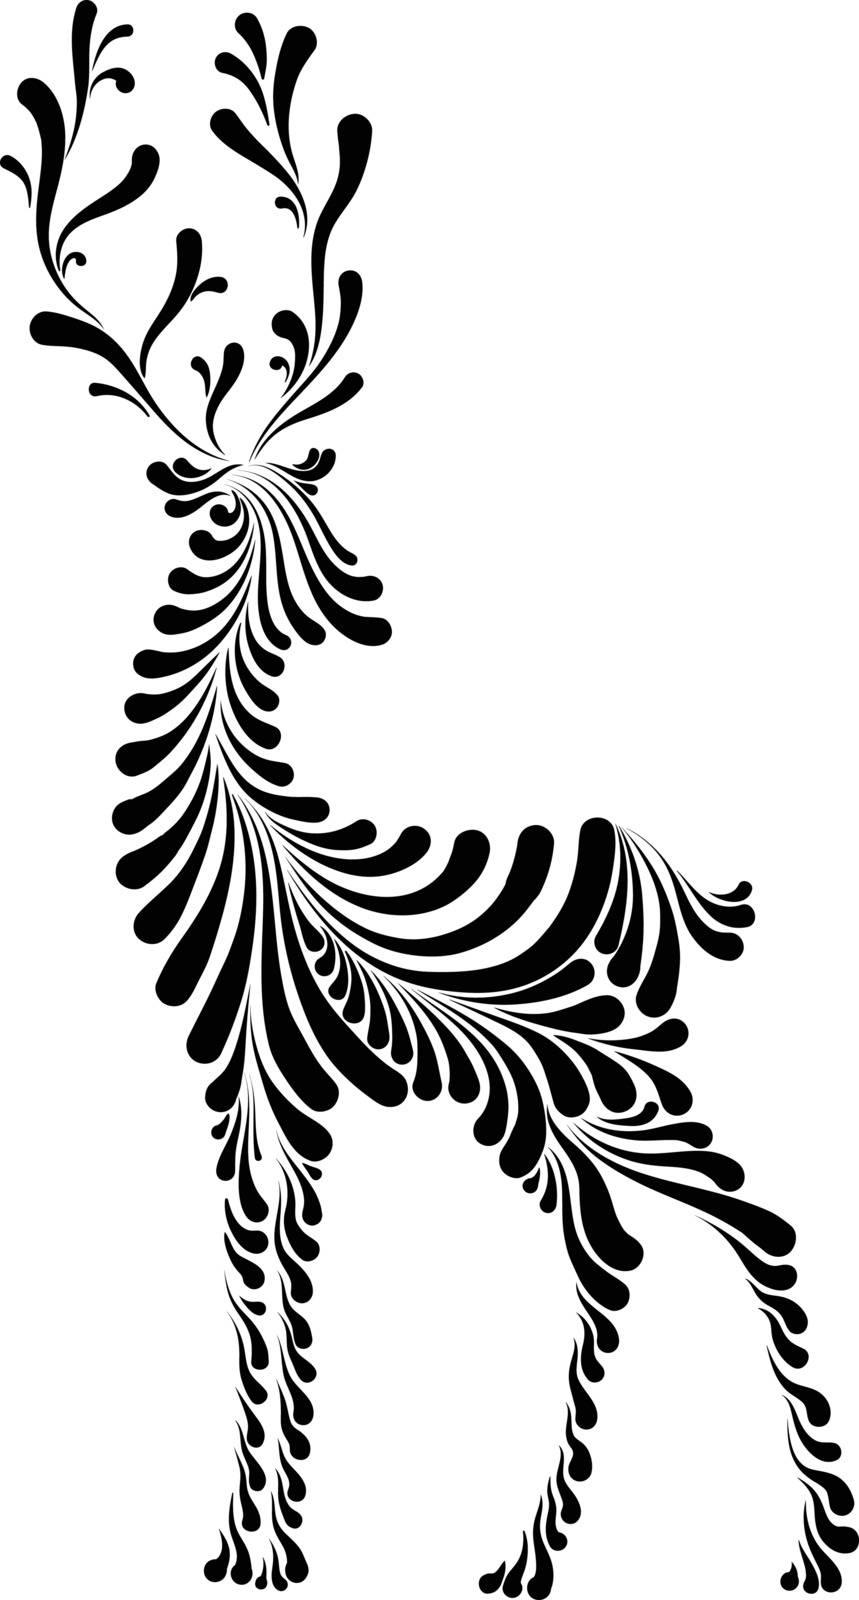 christmas deer of Santa Claus, stylized vector illustration